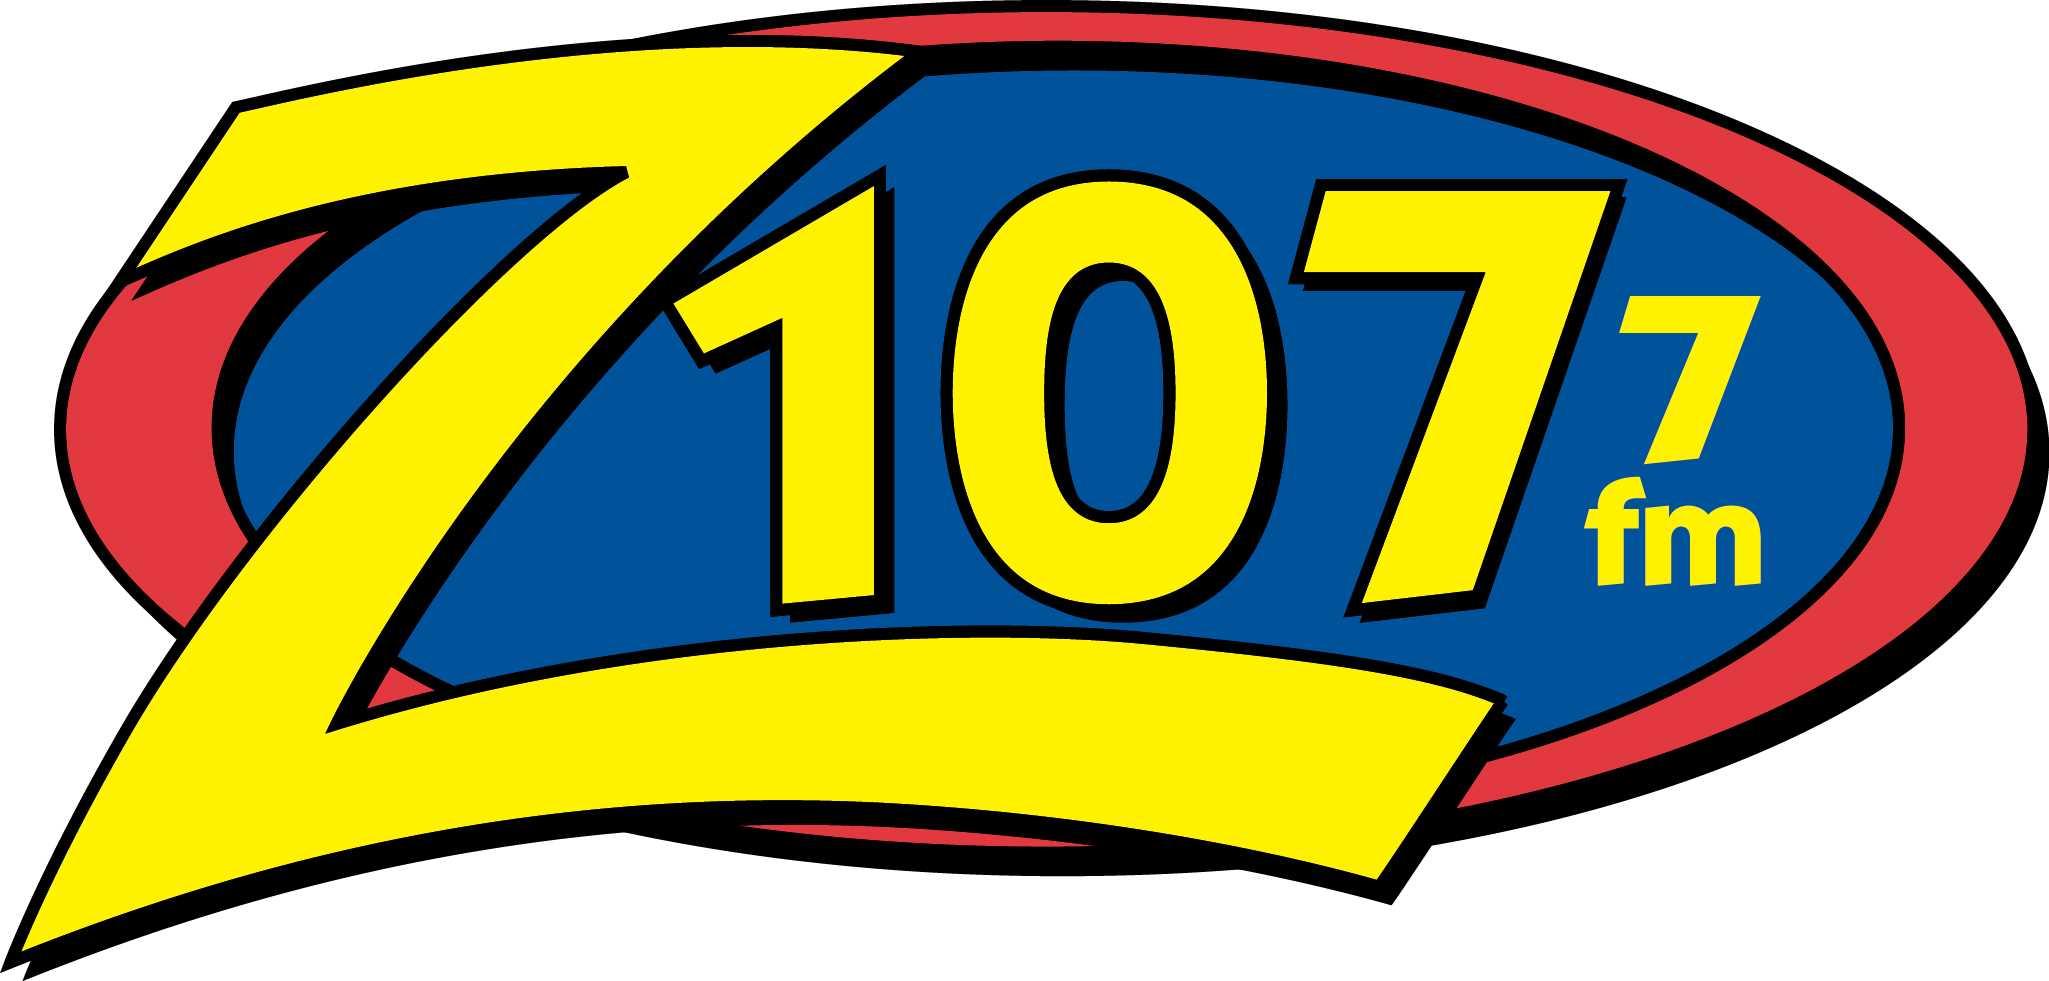 Z107.7